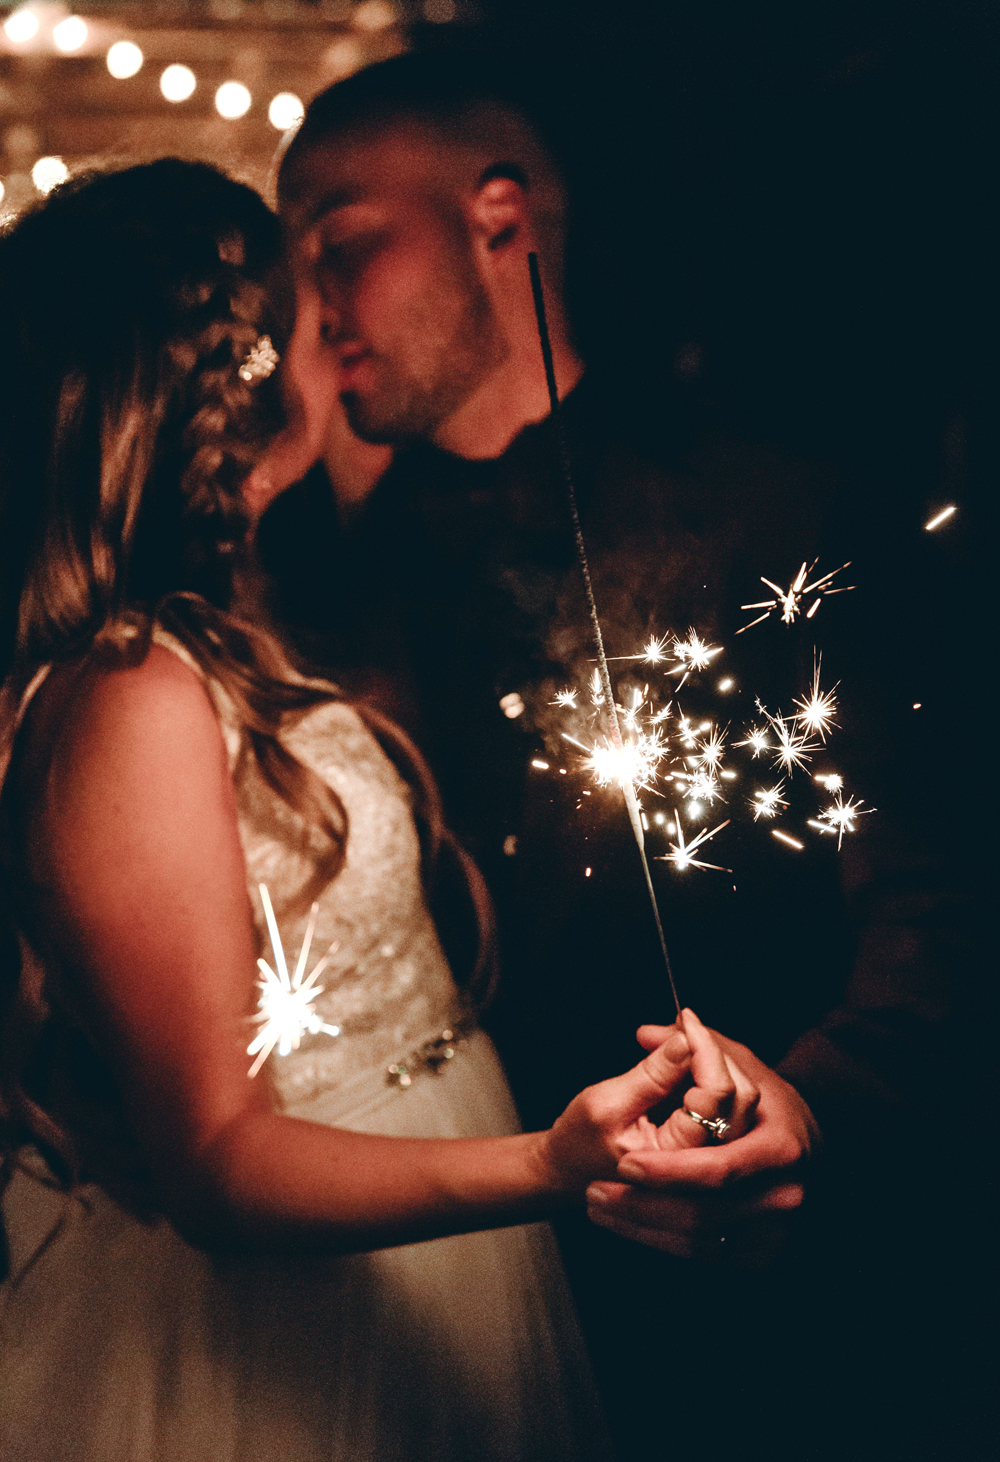 Naples Wedding Photographer, couple with a sparkler